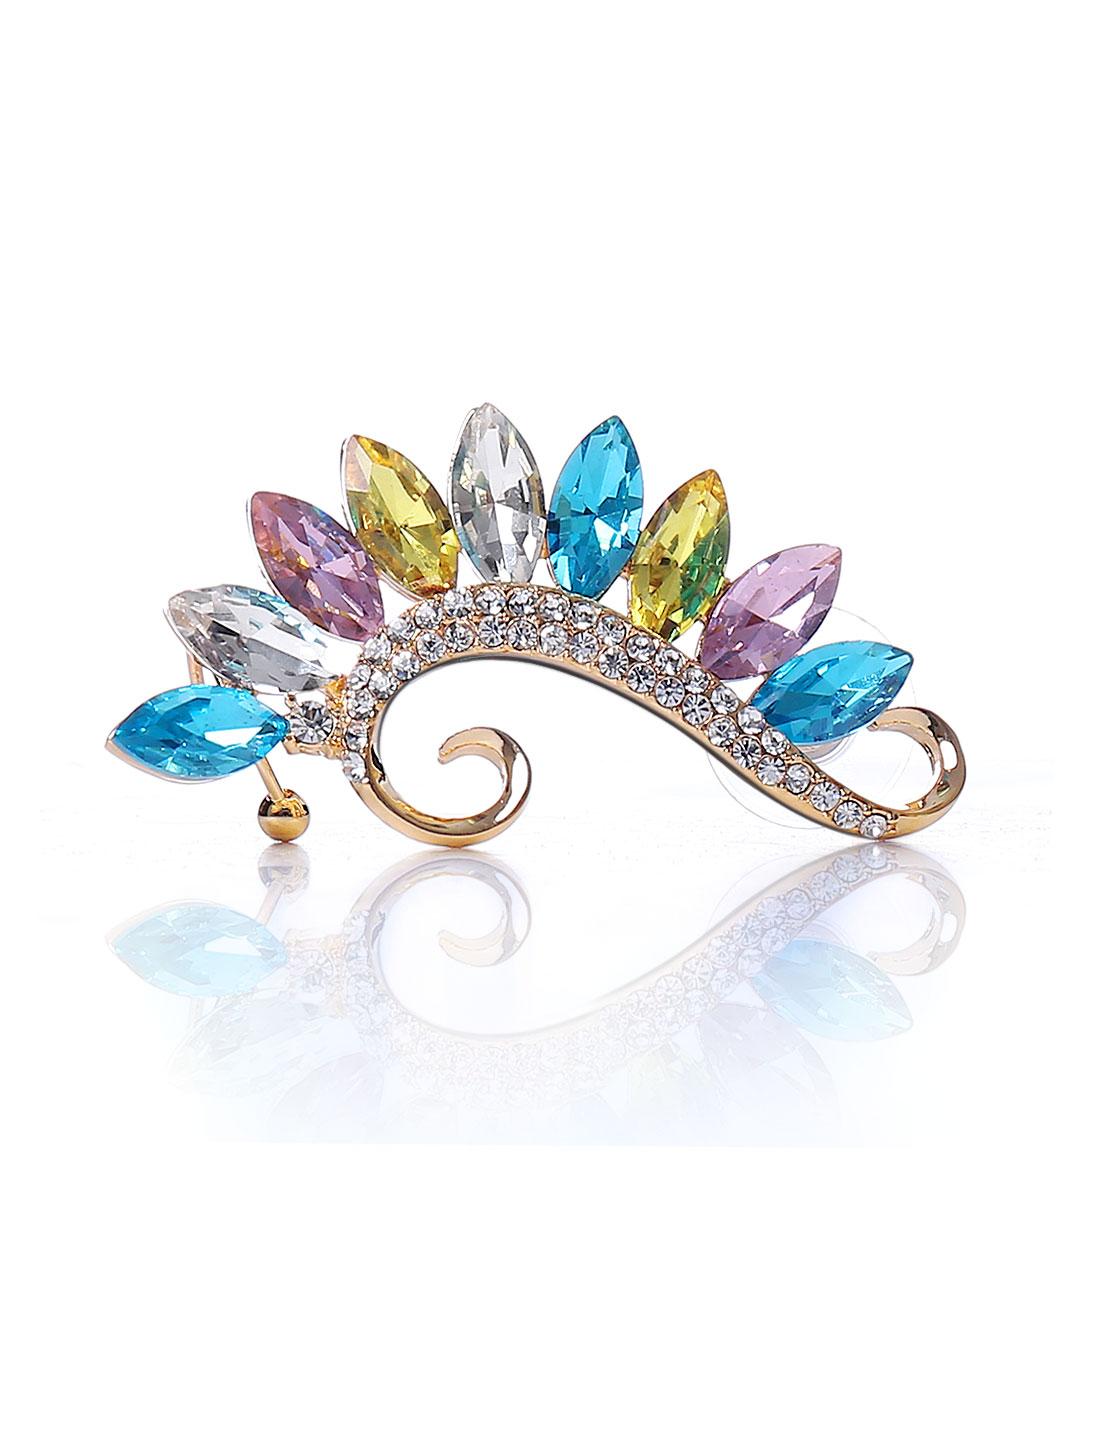 Sea Horse Punk Multi-colored Crystal Ear Rhinestone Clip Cuff Wrap Earring Stud Rock